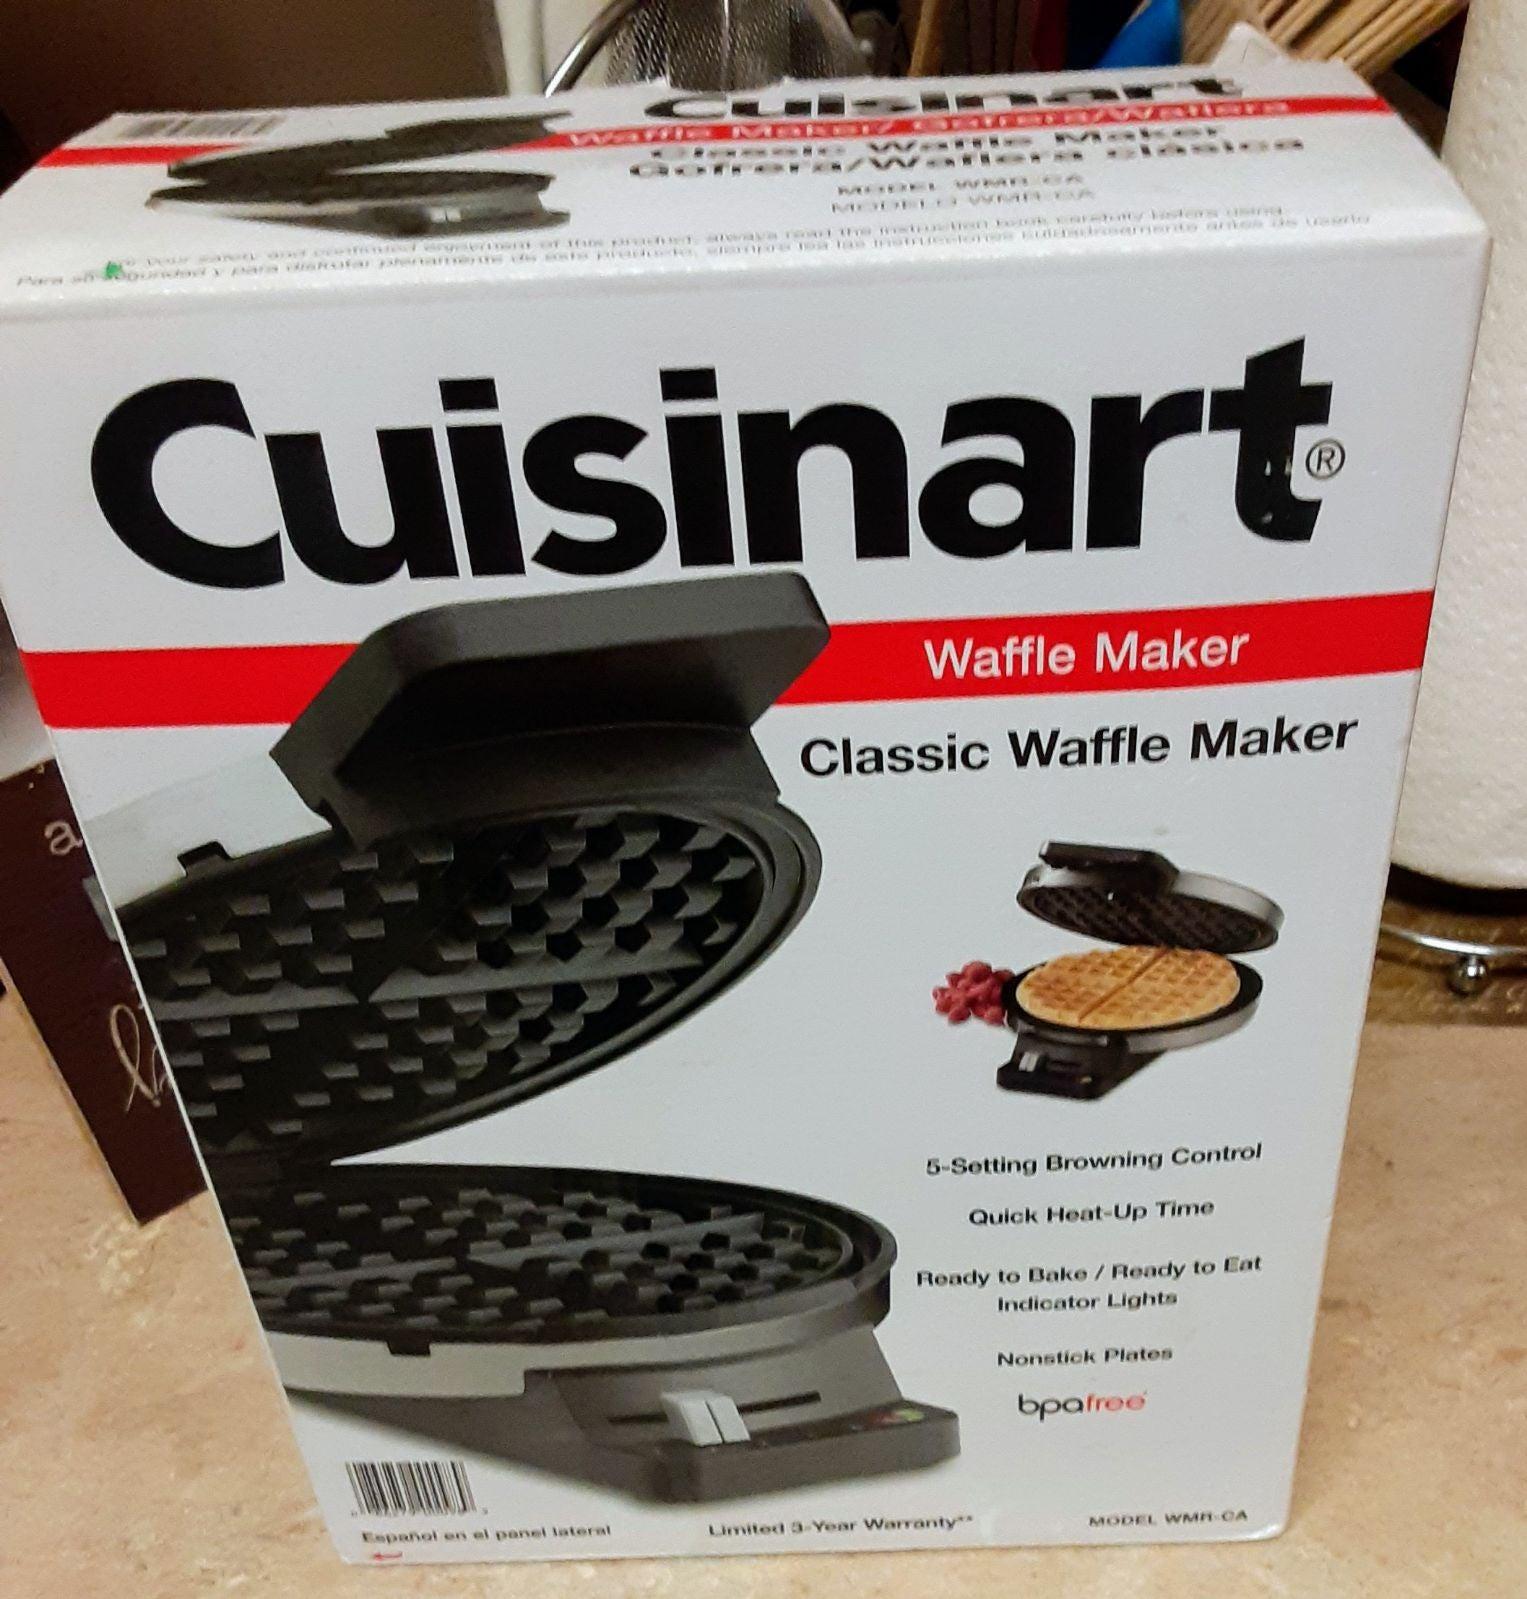 Cuisinart brand new waffle iron still in